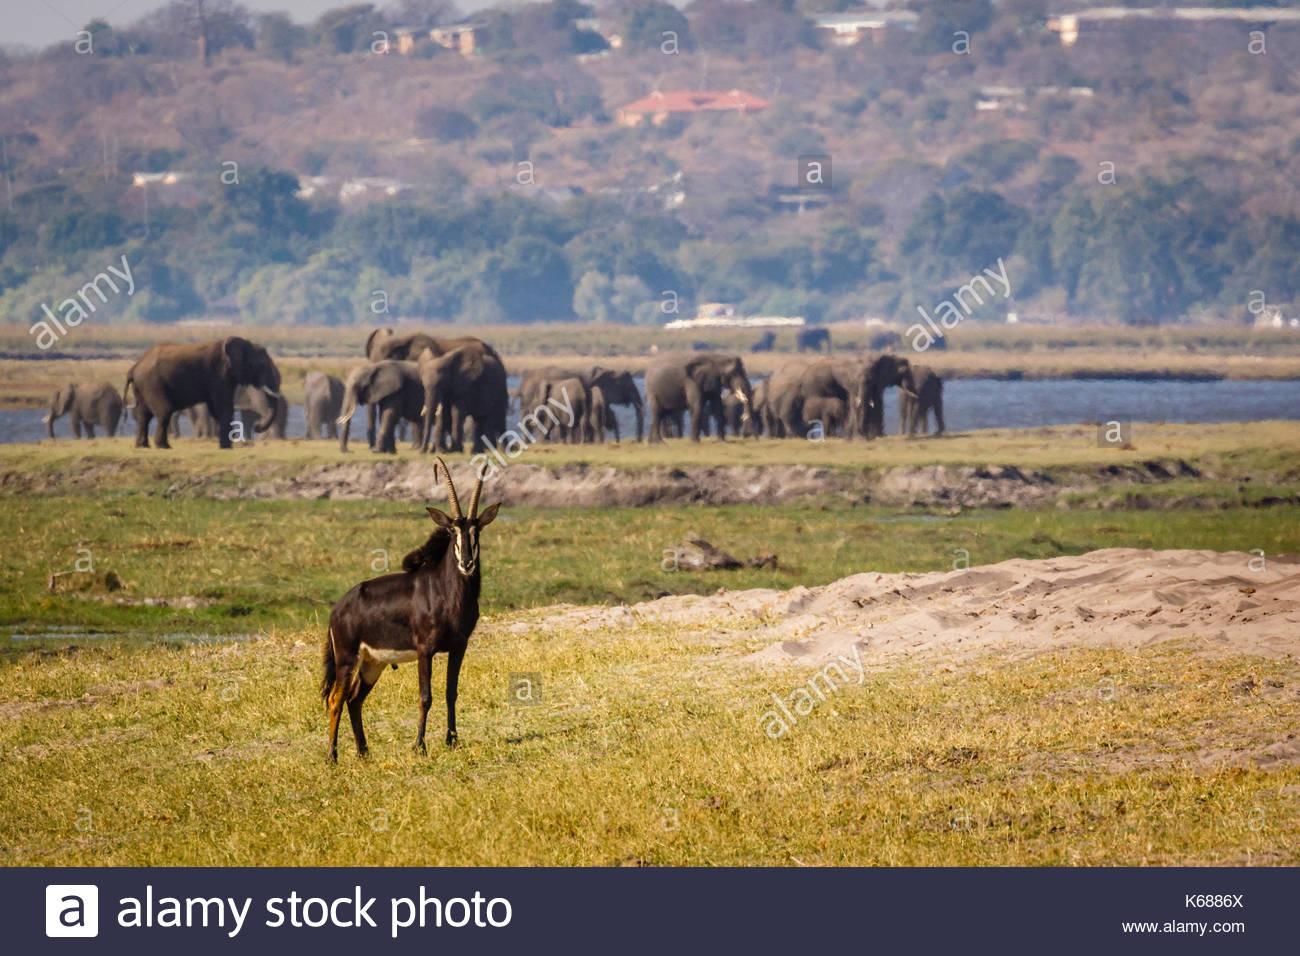 Sable Antelope in Chobe National Park taken on Safari in Botswana, Africa - Stock Image